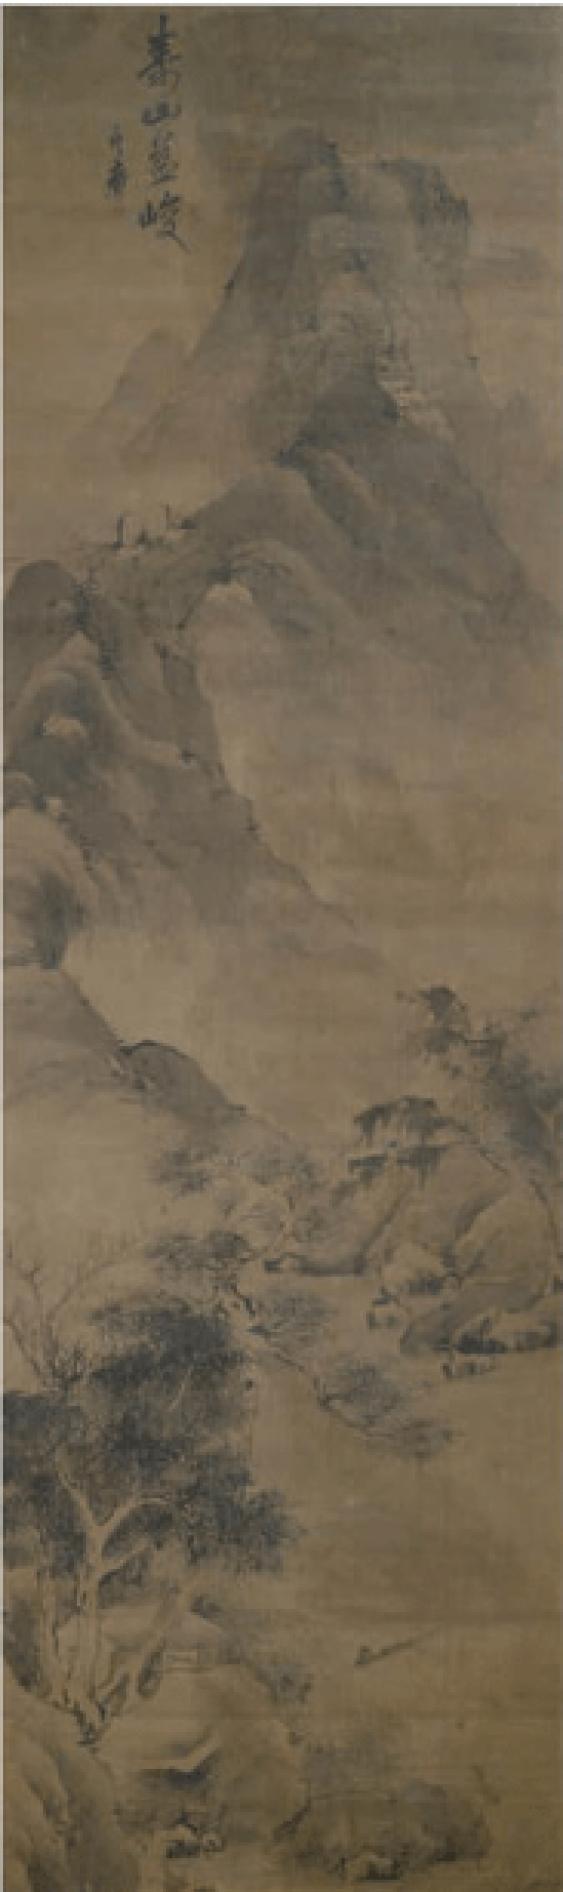 Mountain landscape - photo 1